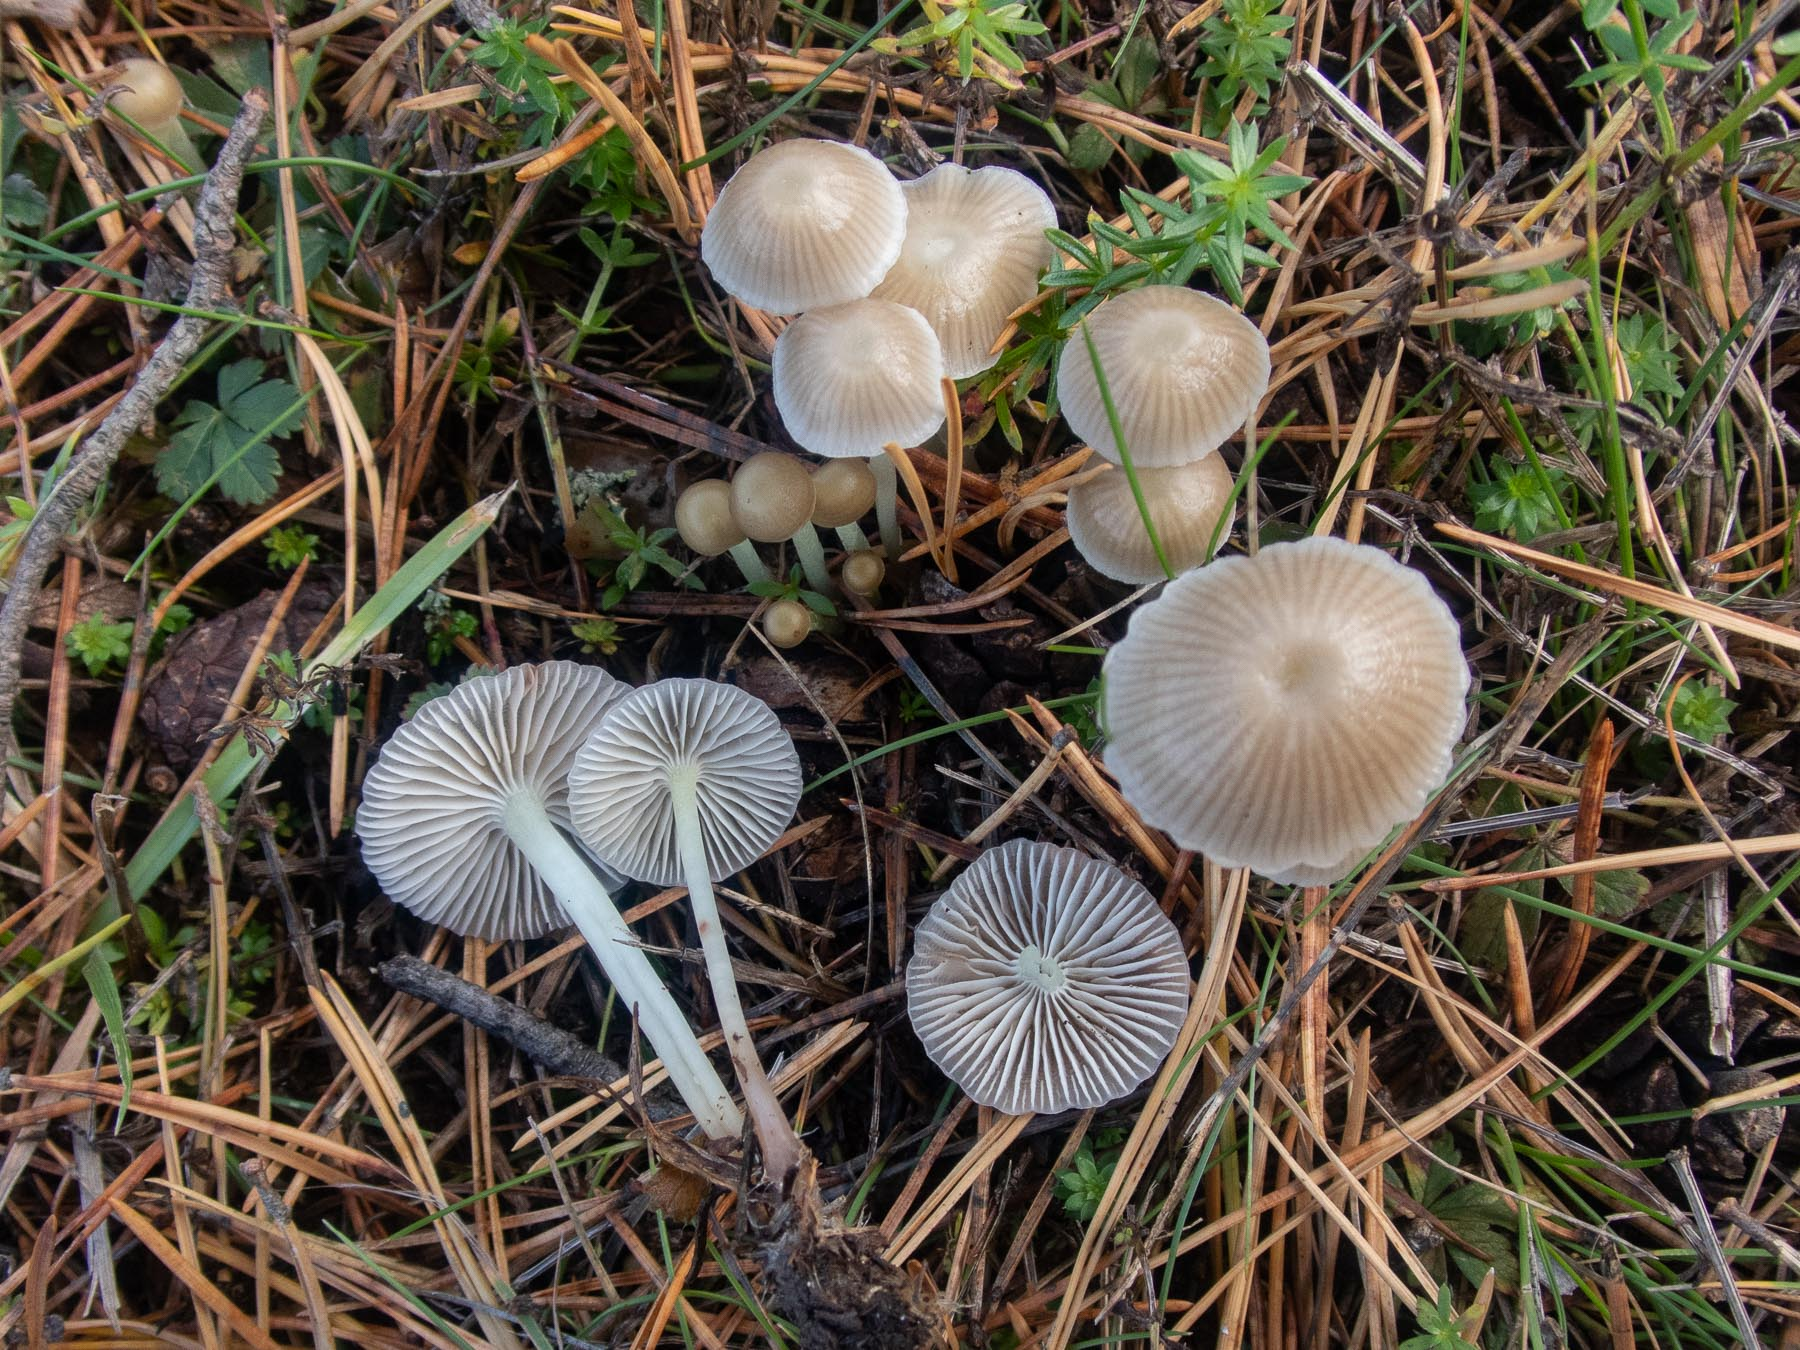 Мицена слизистая (Mycena epipterygia). Автор фото: Сутормина Марина